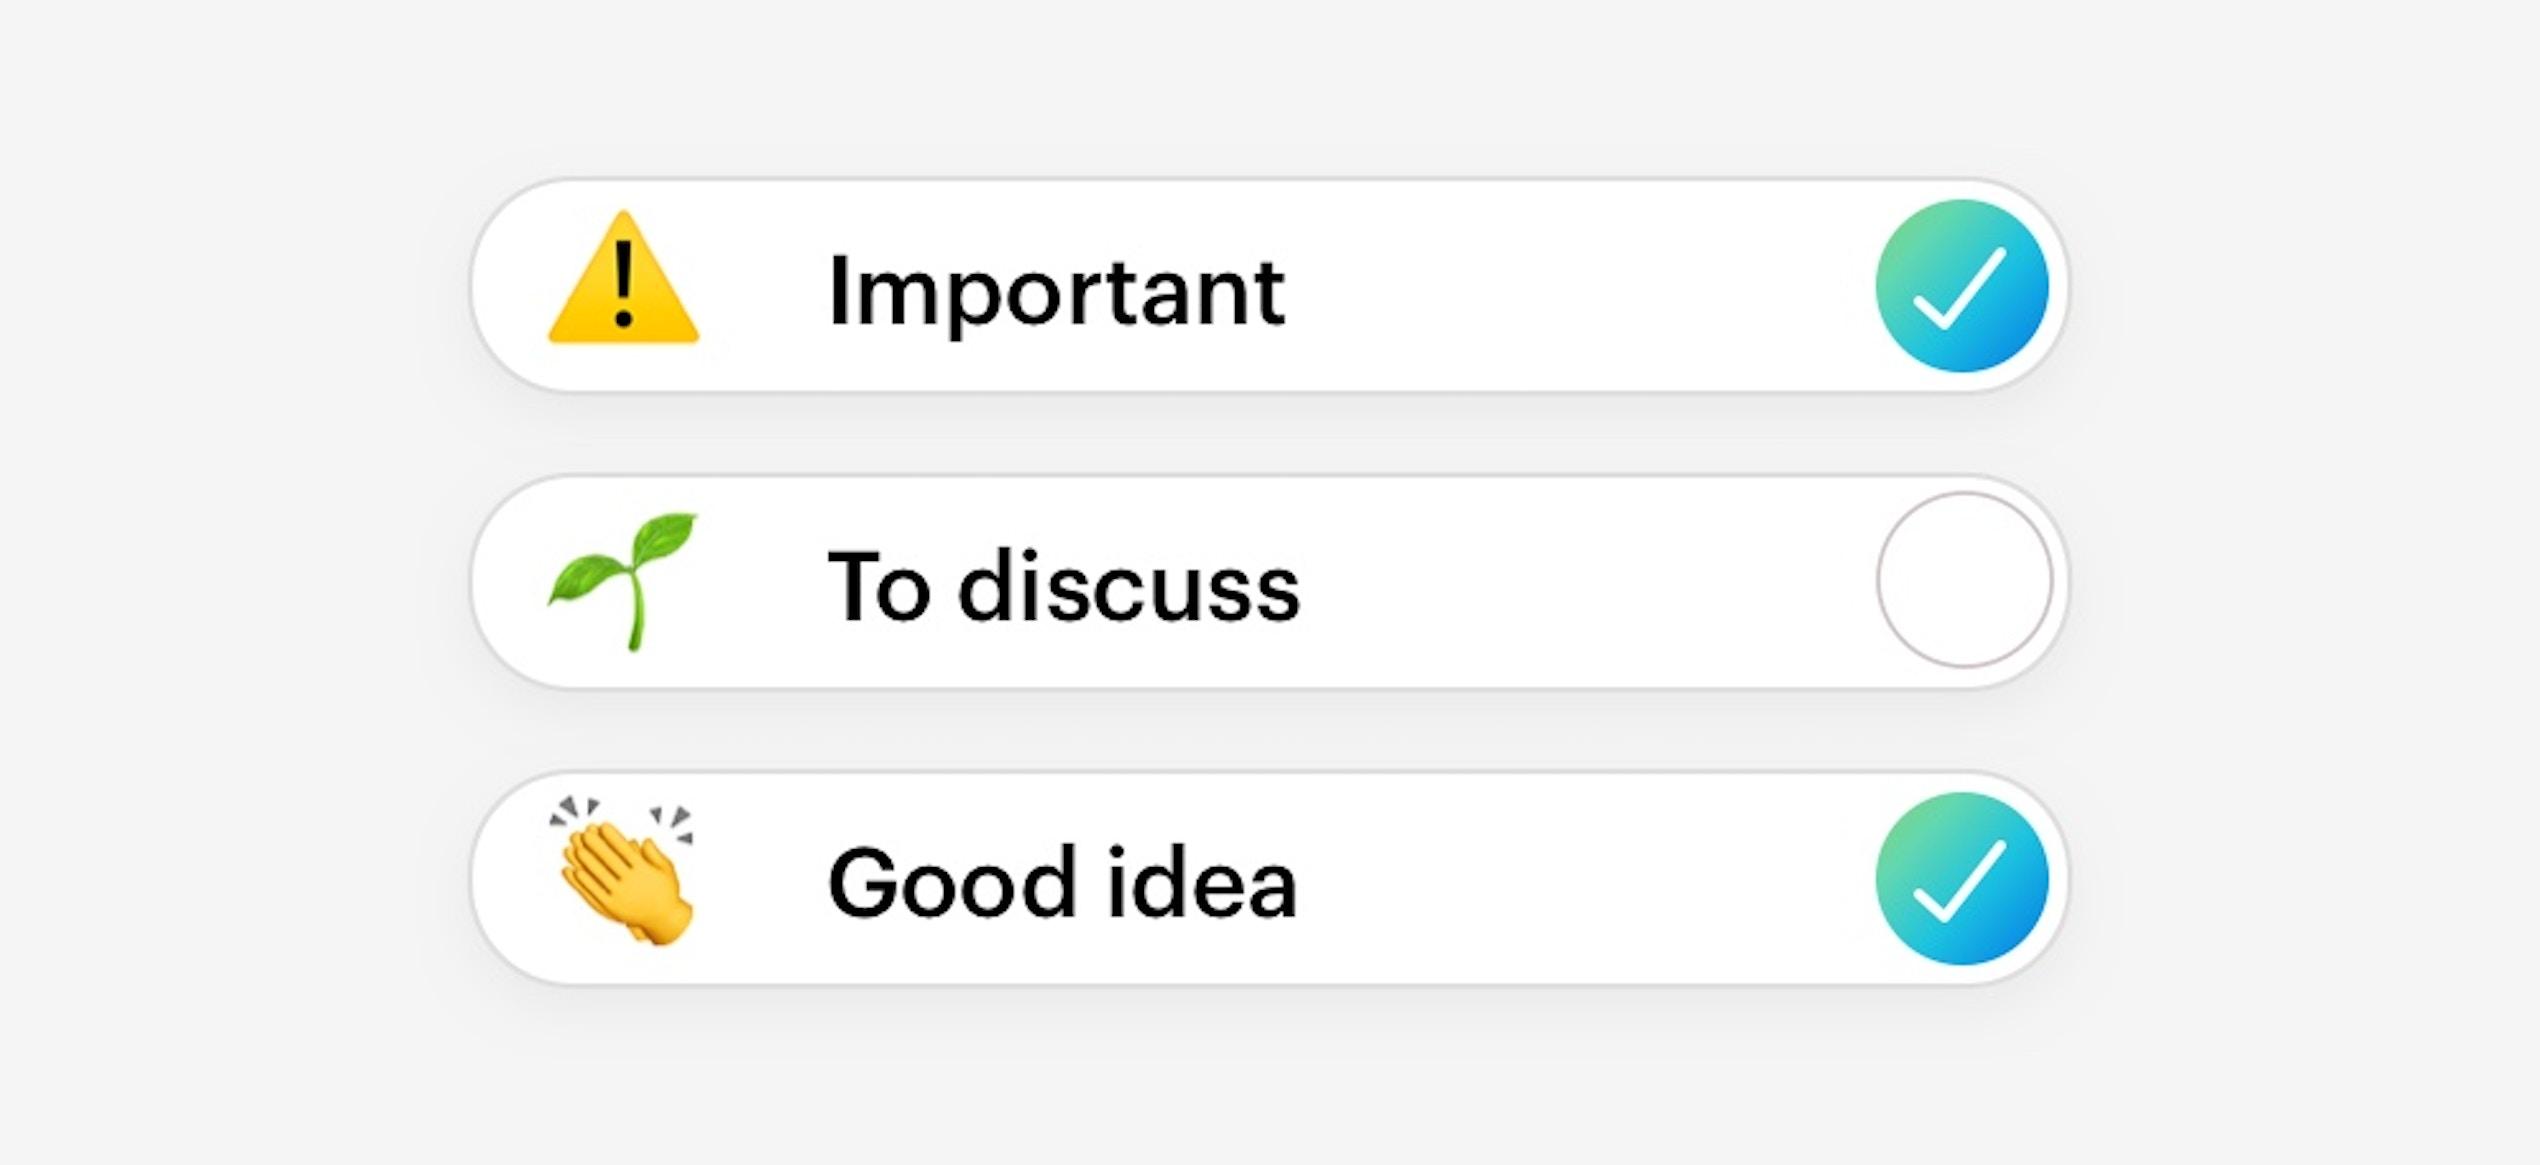 Group, sort, prioritize